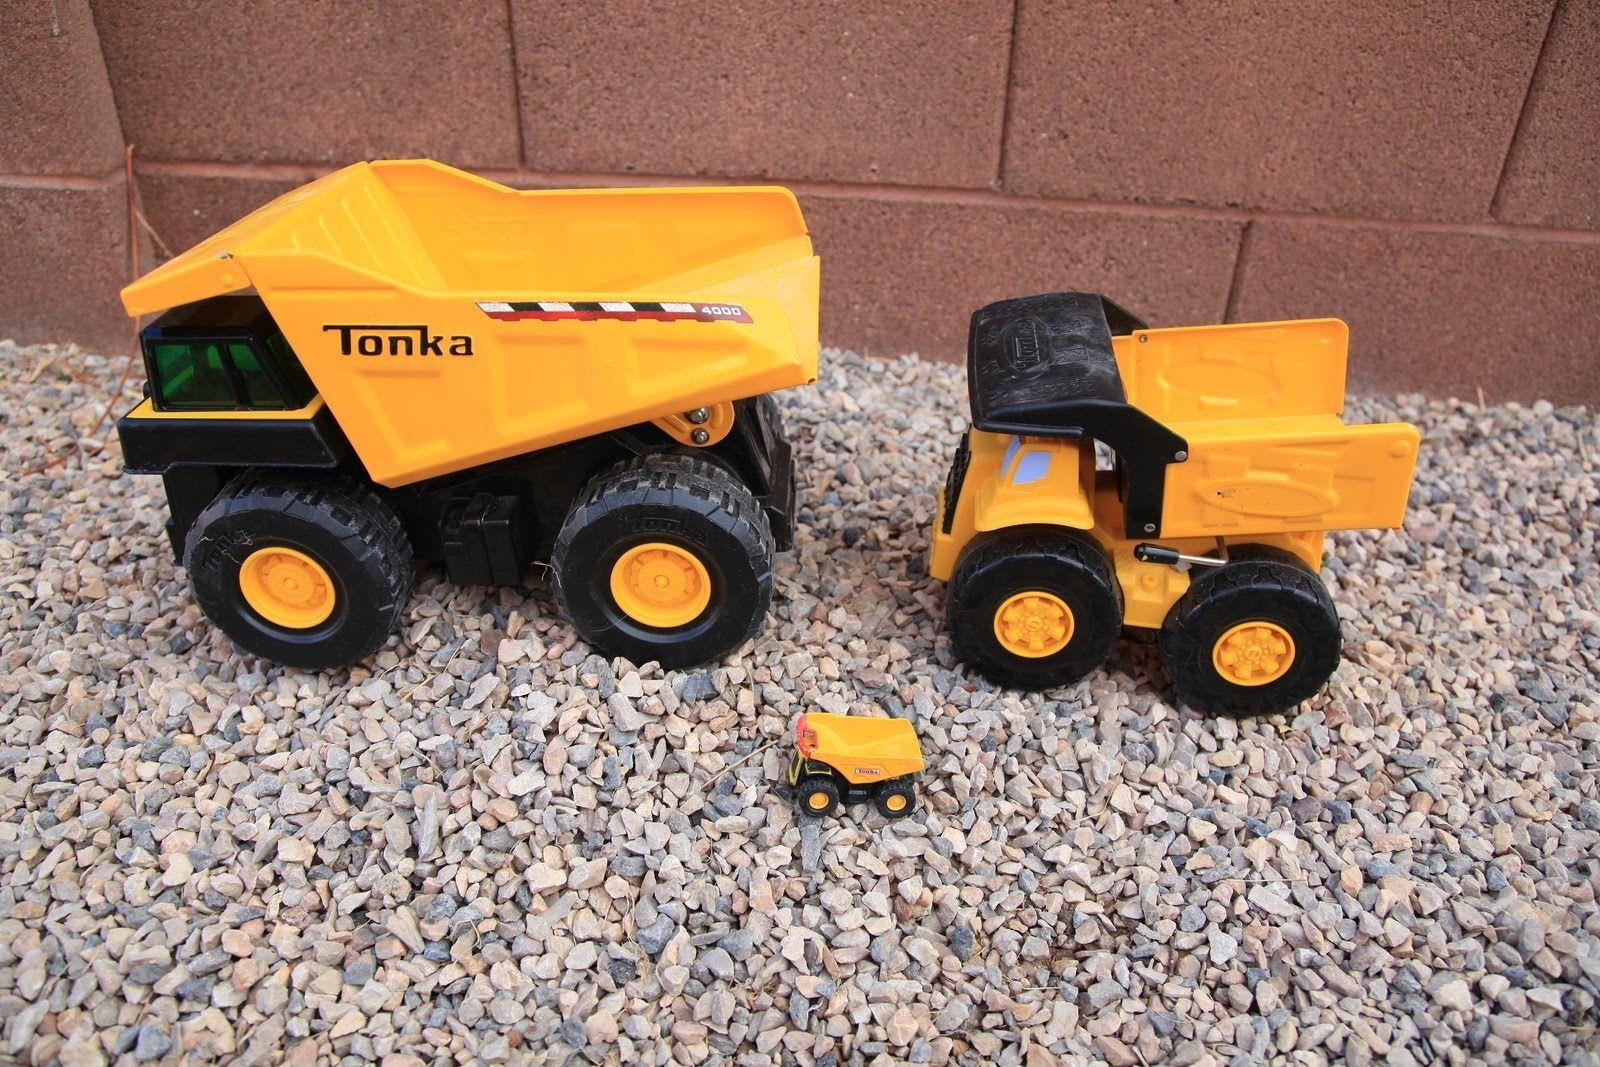 Backhoe clipart truck tonka. Big metal toy dump